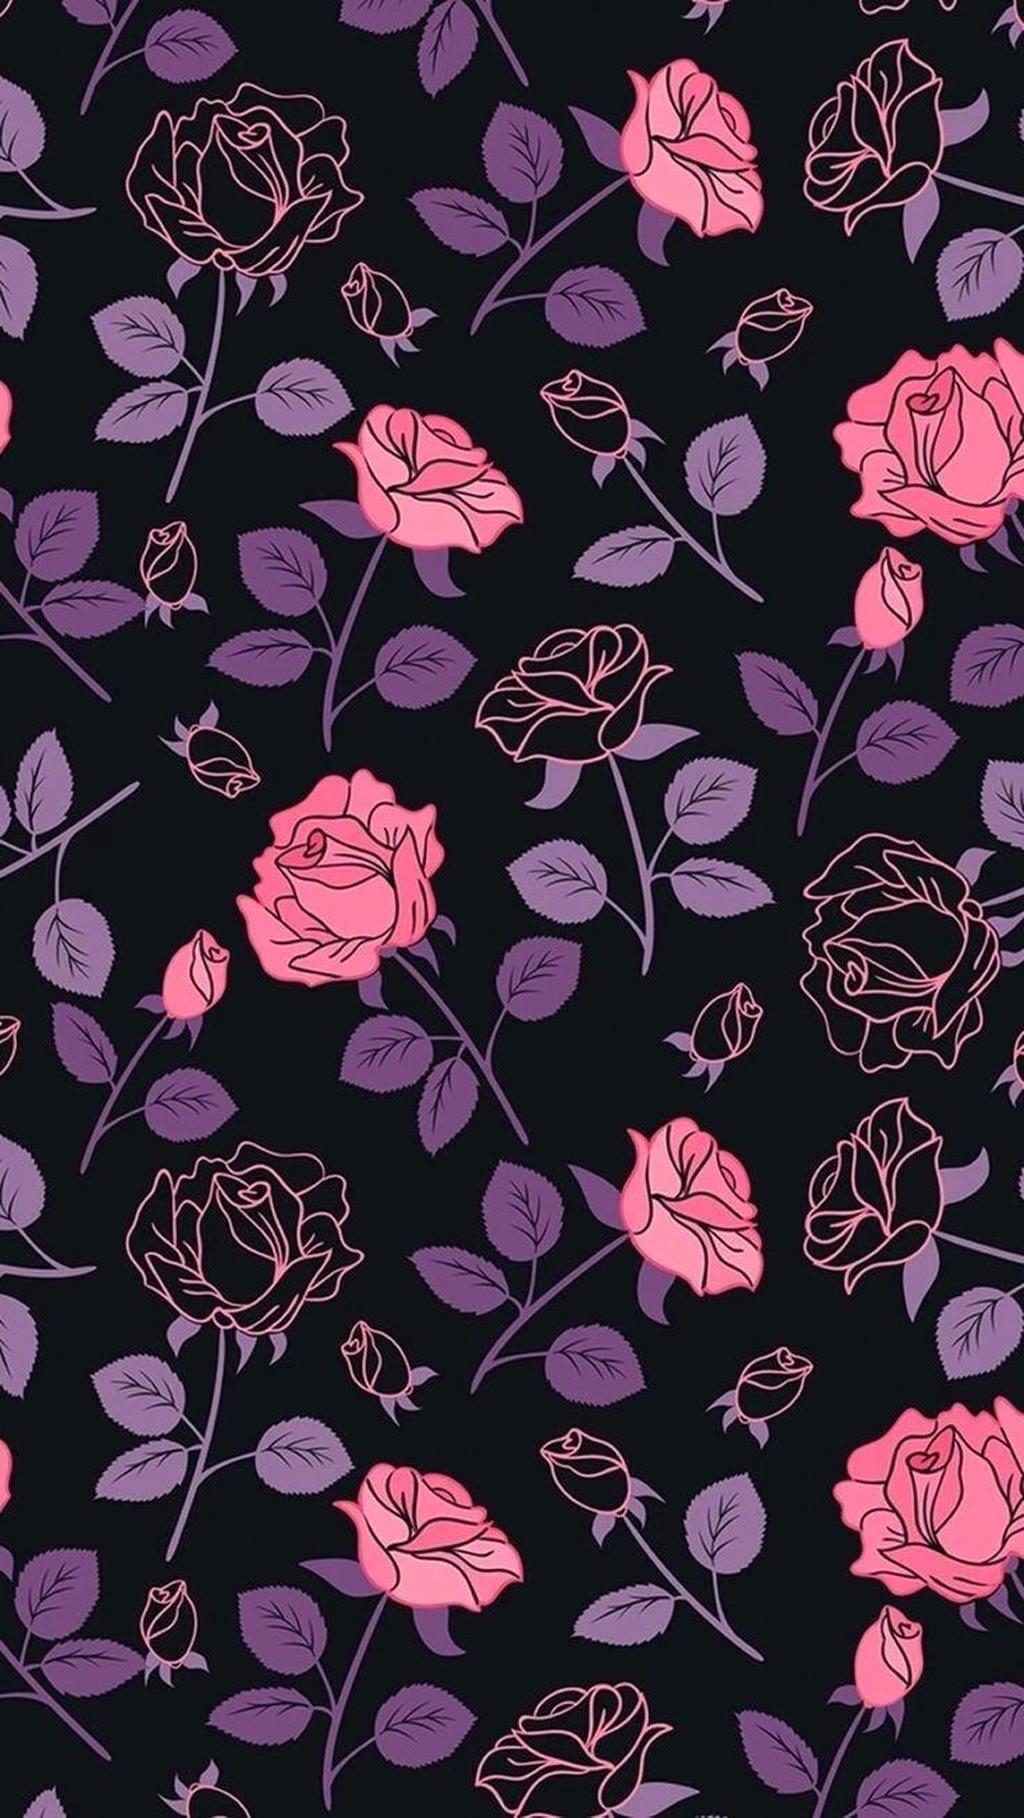 Free Download Real Dark Floral Iphone Wallpapers Top Real Dark